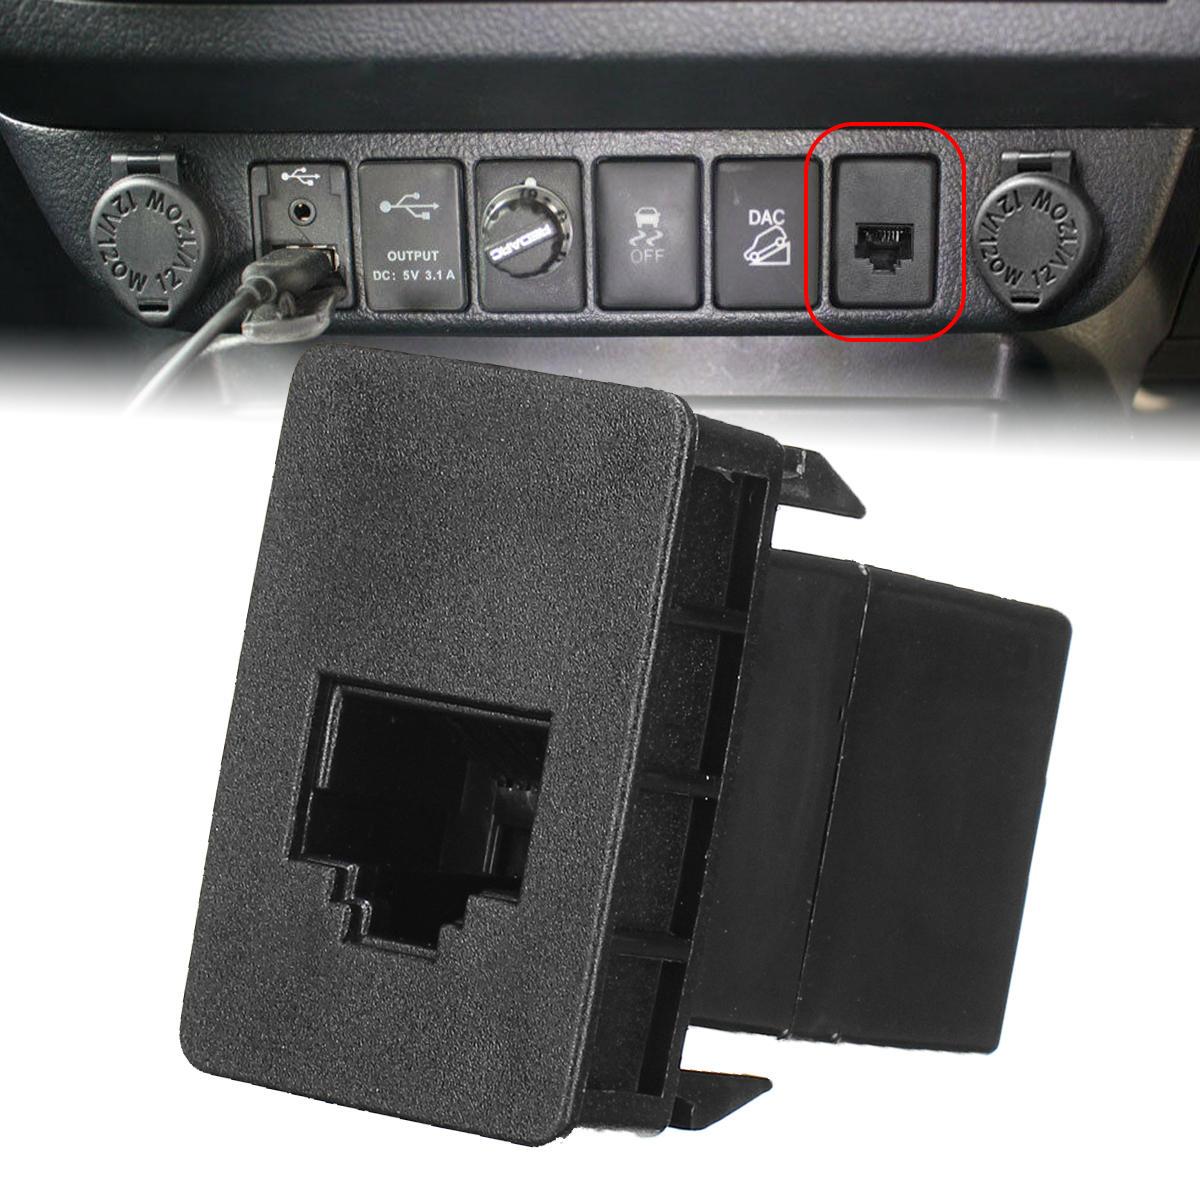 Car CB UHF Blank Socket RJ45 Radio Switch Panel Dash For Toyota Hilux Landcruiser RAV4 Prado